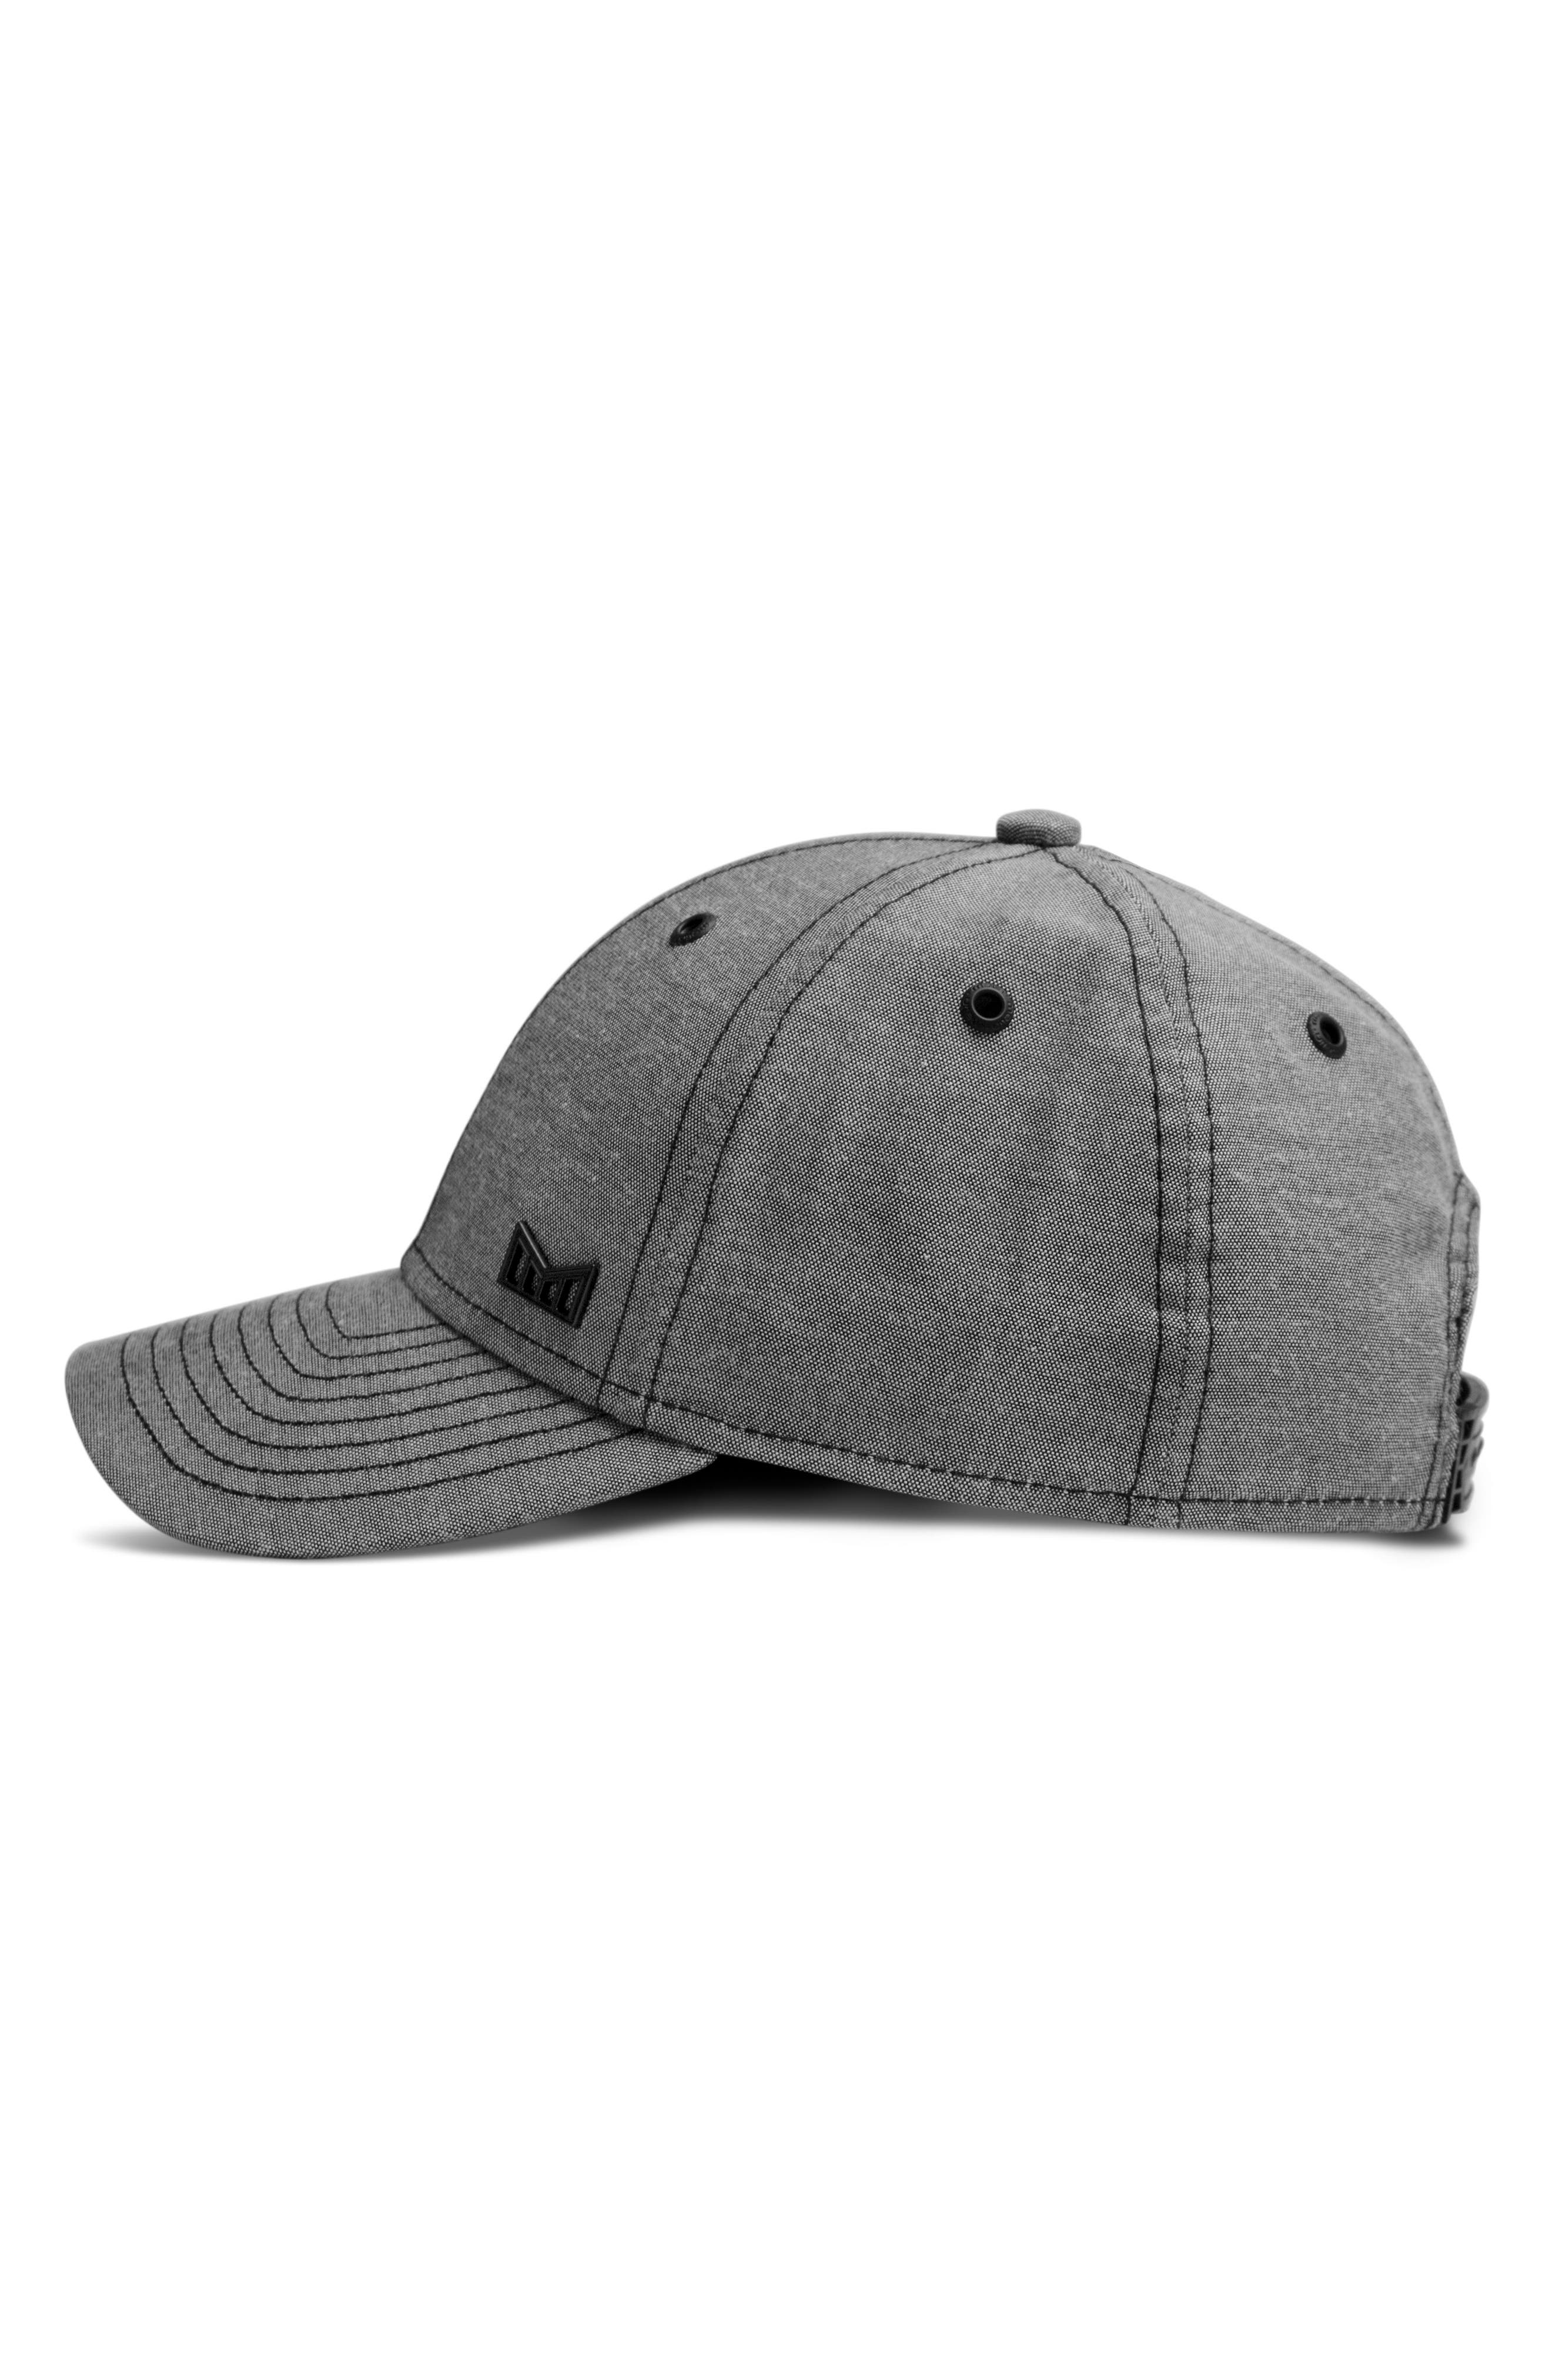 Scholar Snapback Baseball Cap,                             Alternate thumbnail 4, color,                             Black